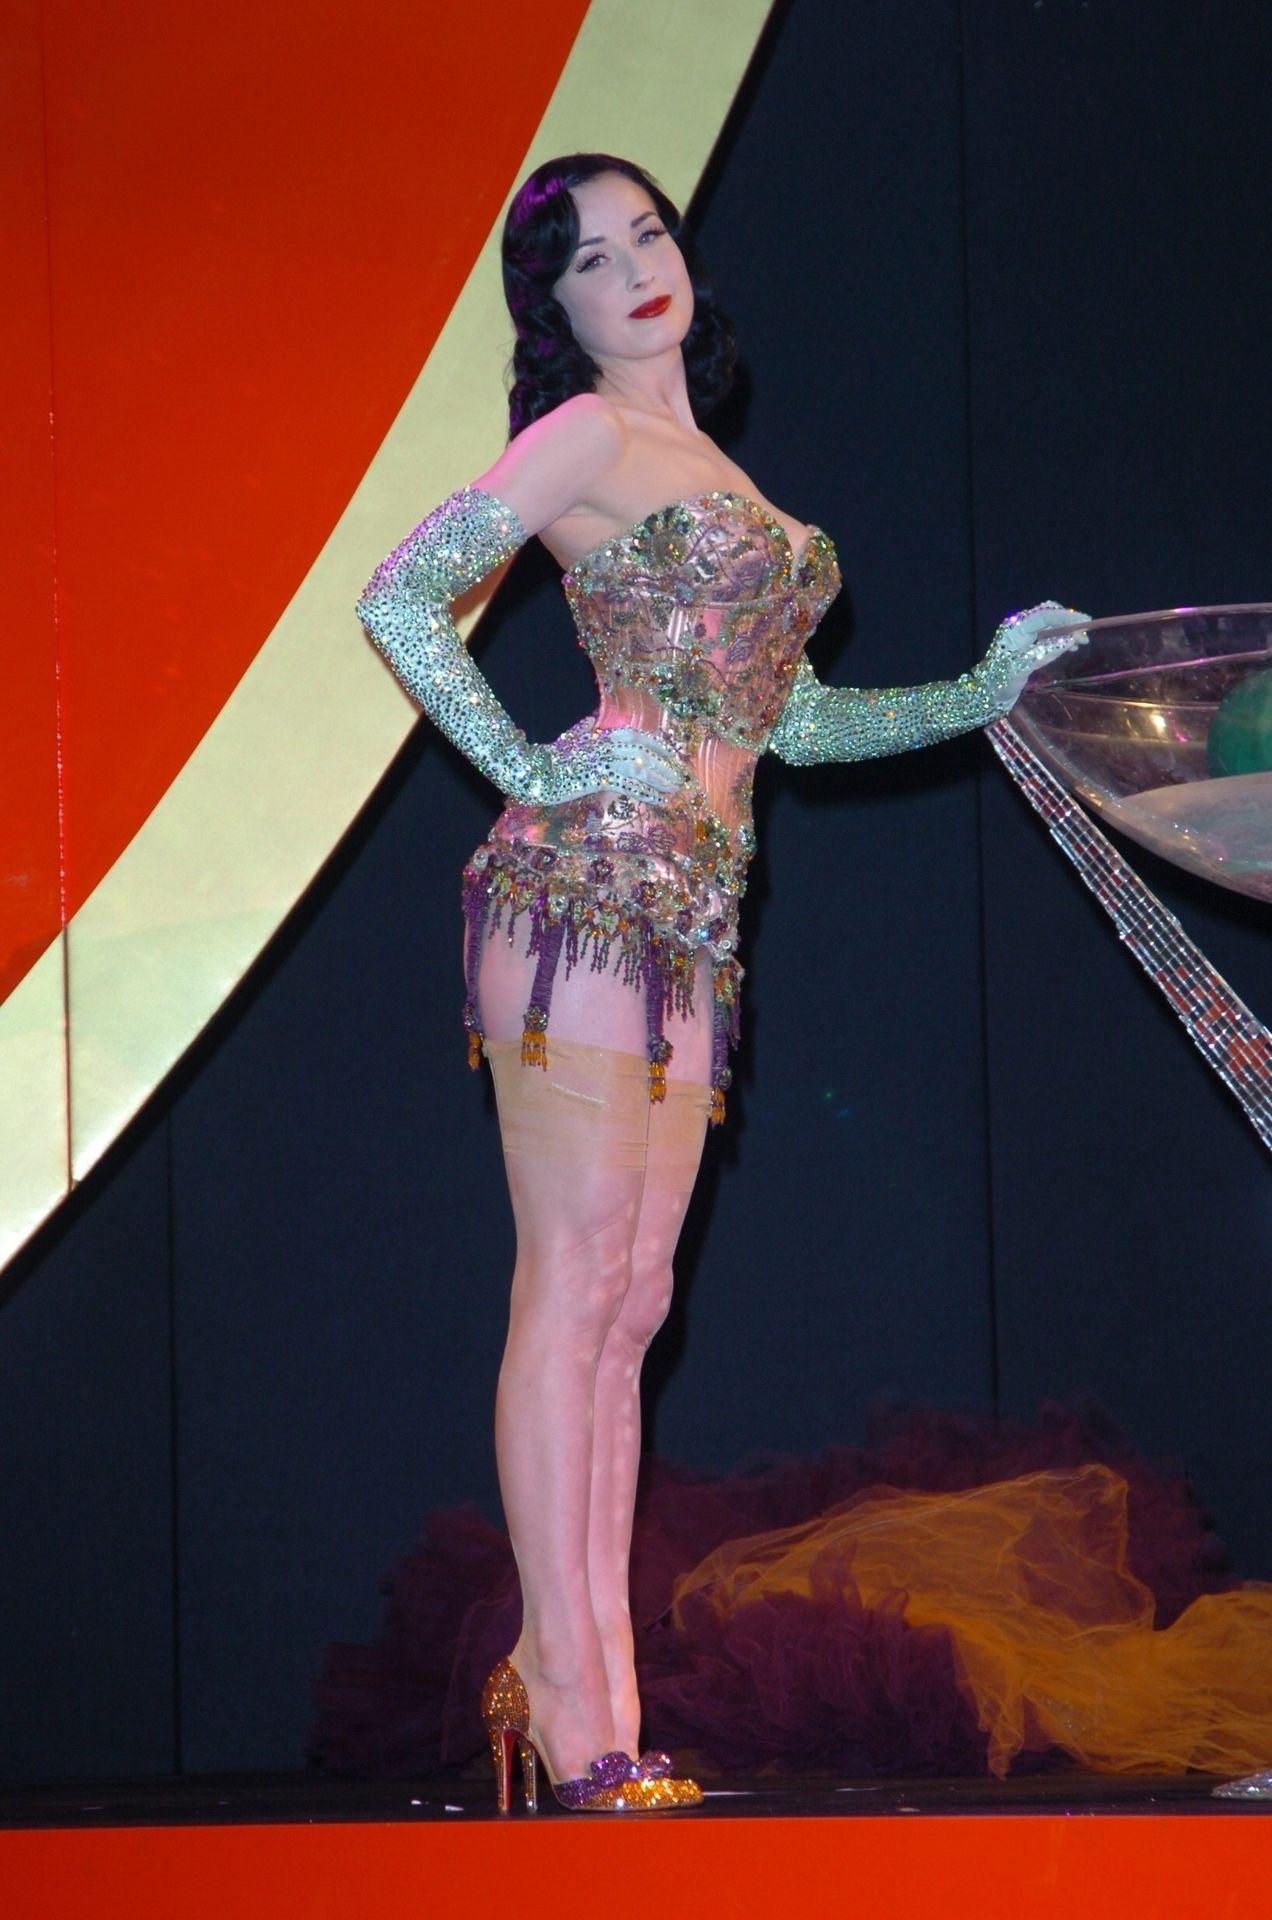 Dita Von Teese Performs At Erotica 06 In London 0018